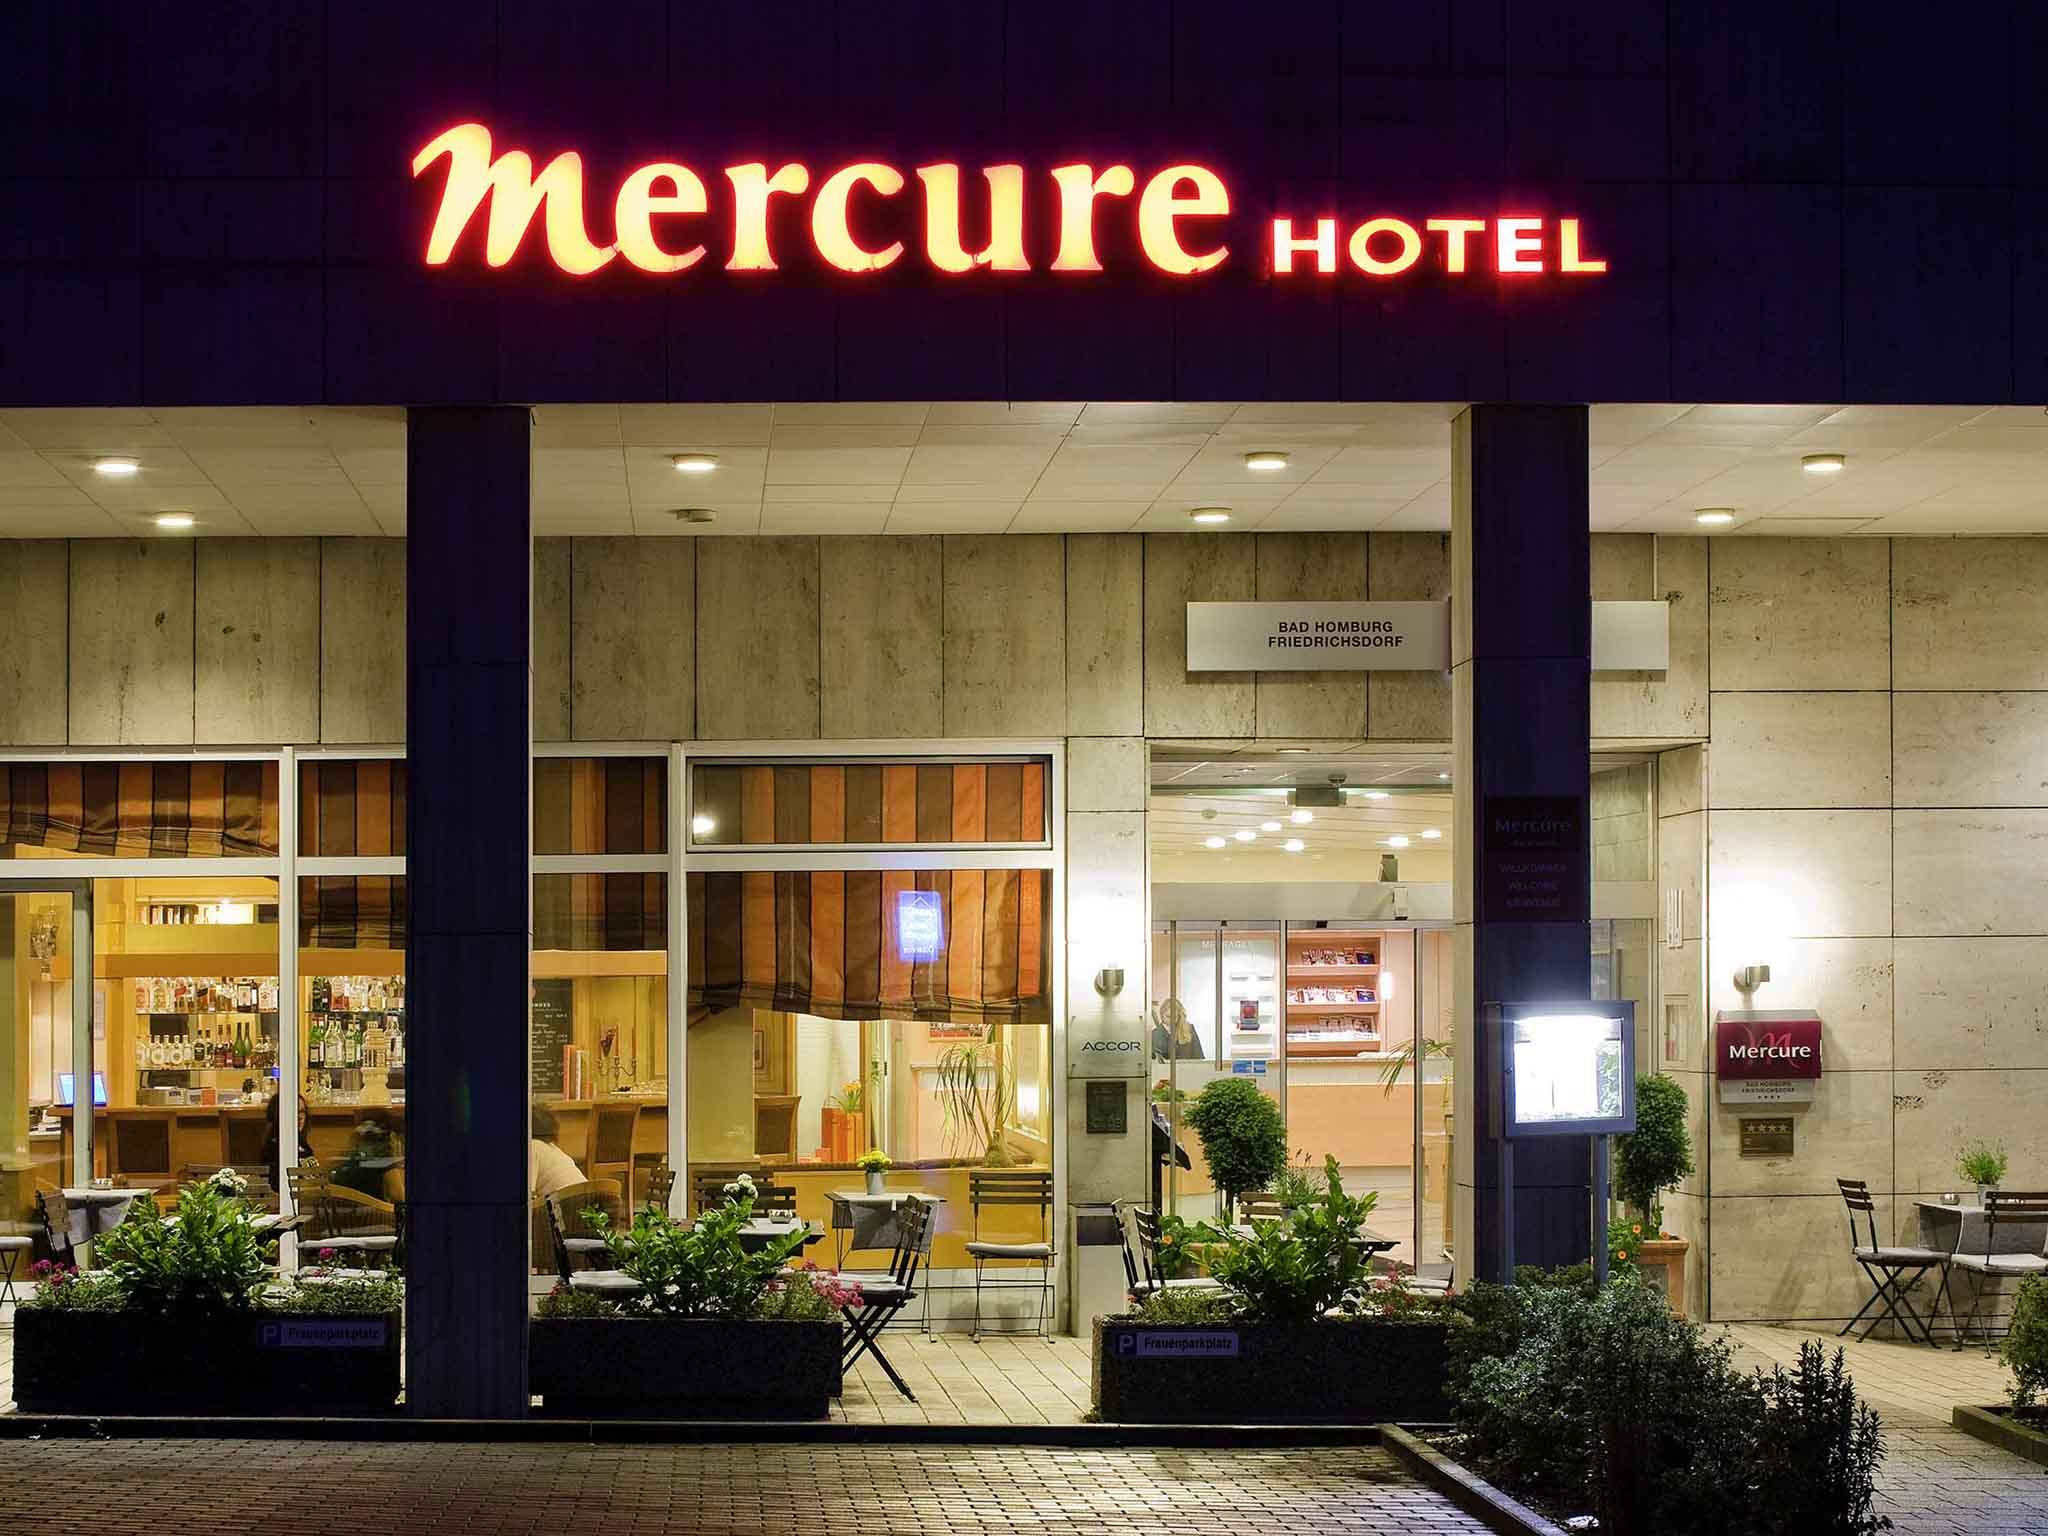 Hotel – Mercure Hotel Bad Homburg Friedrichsdorf